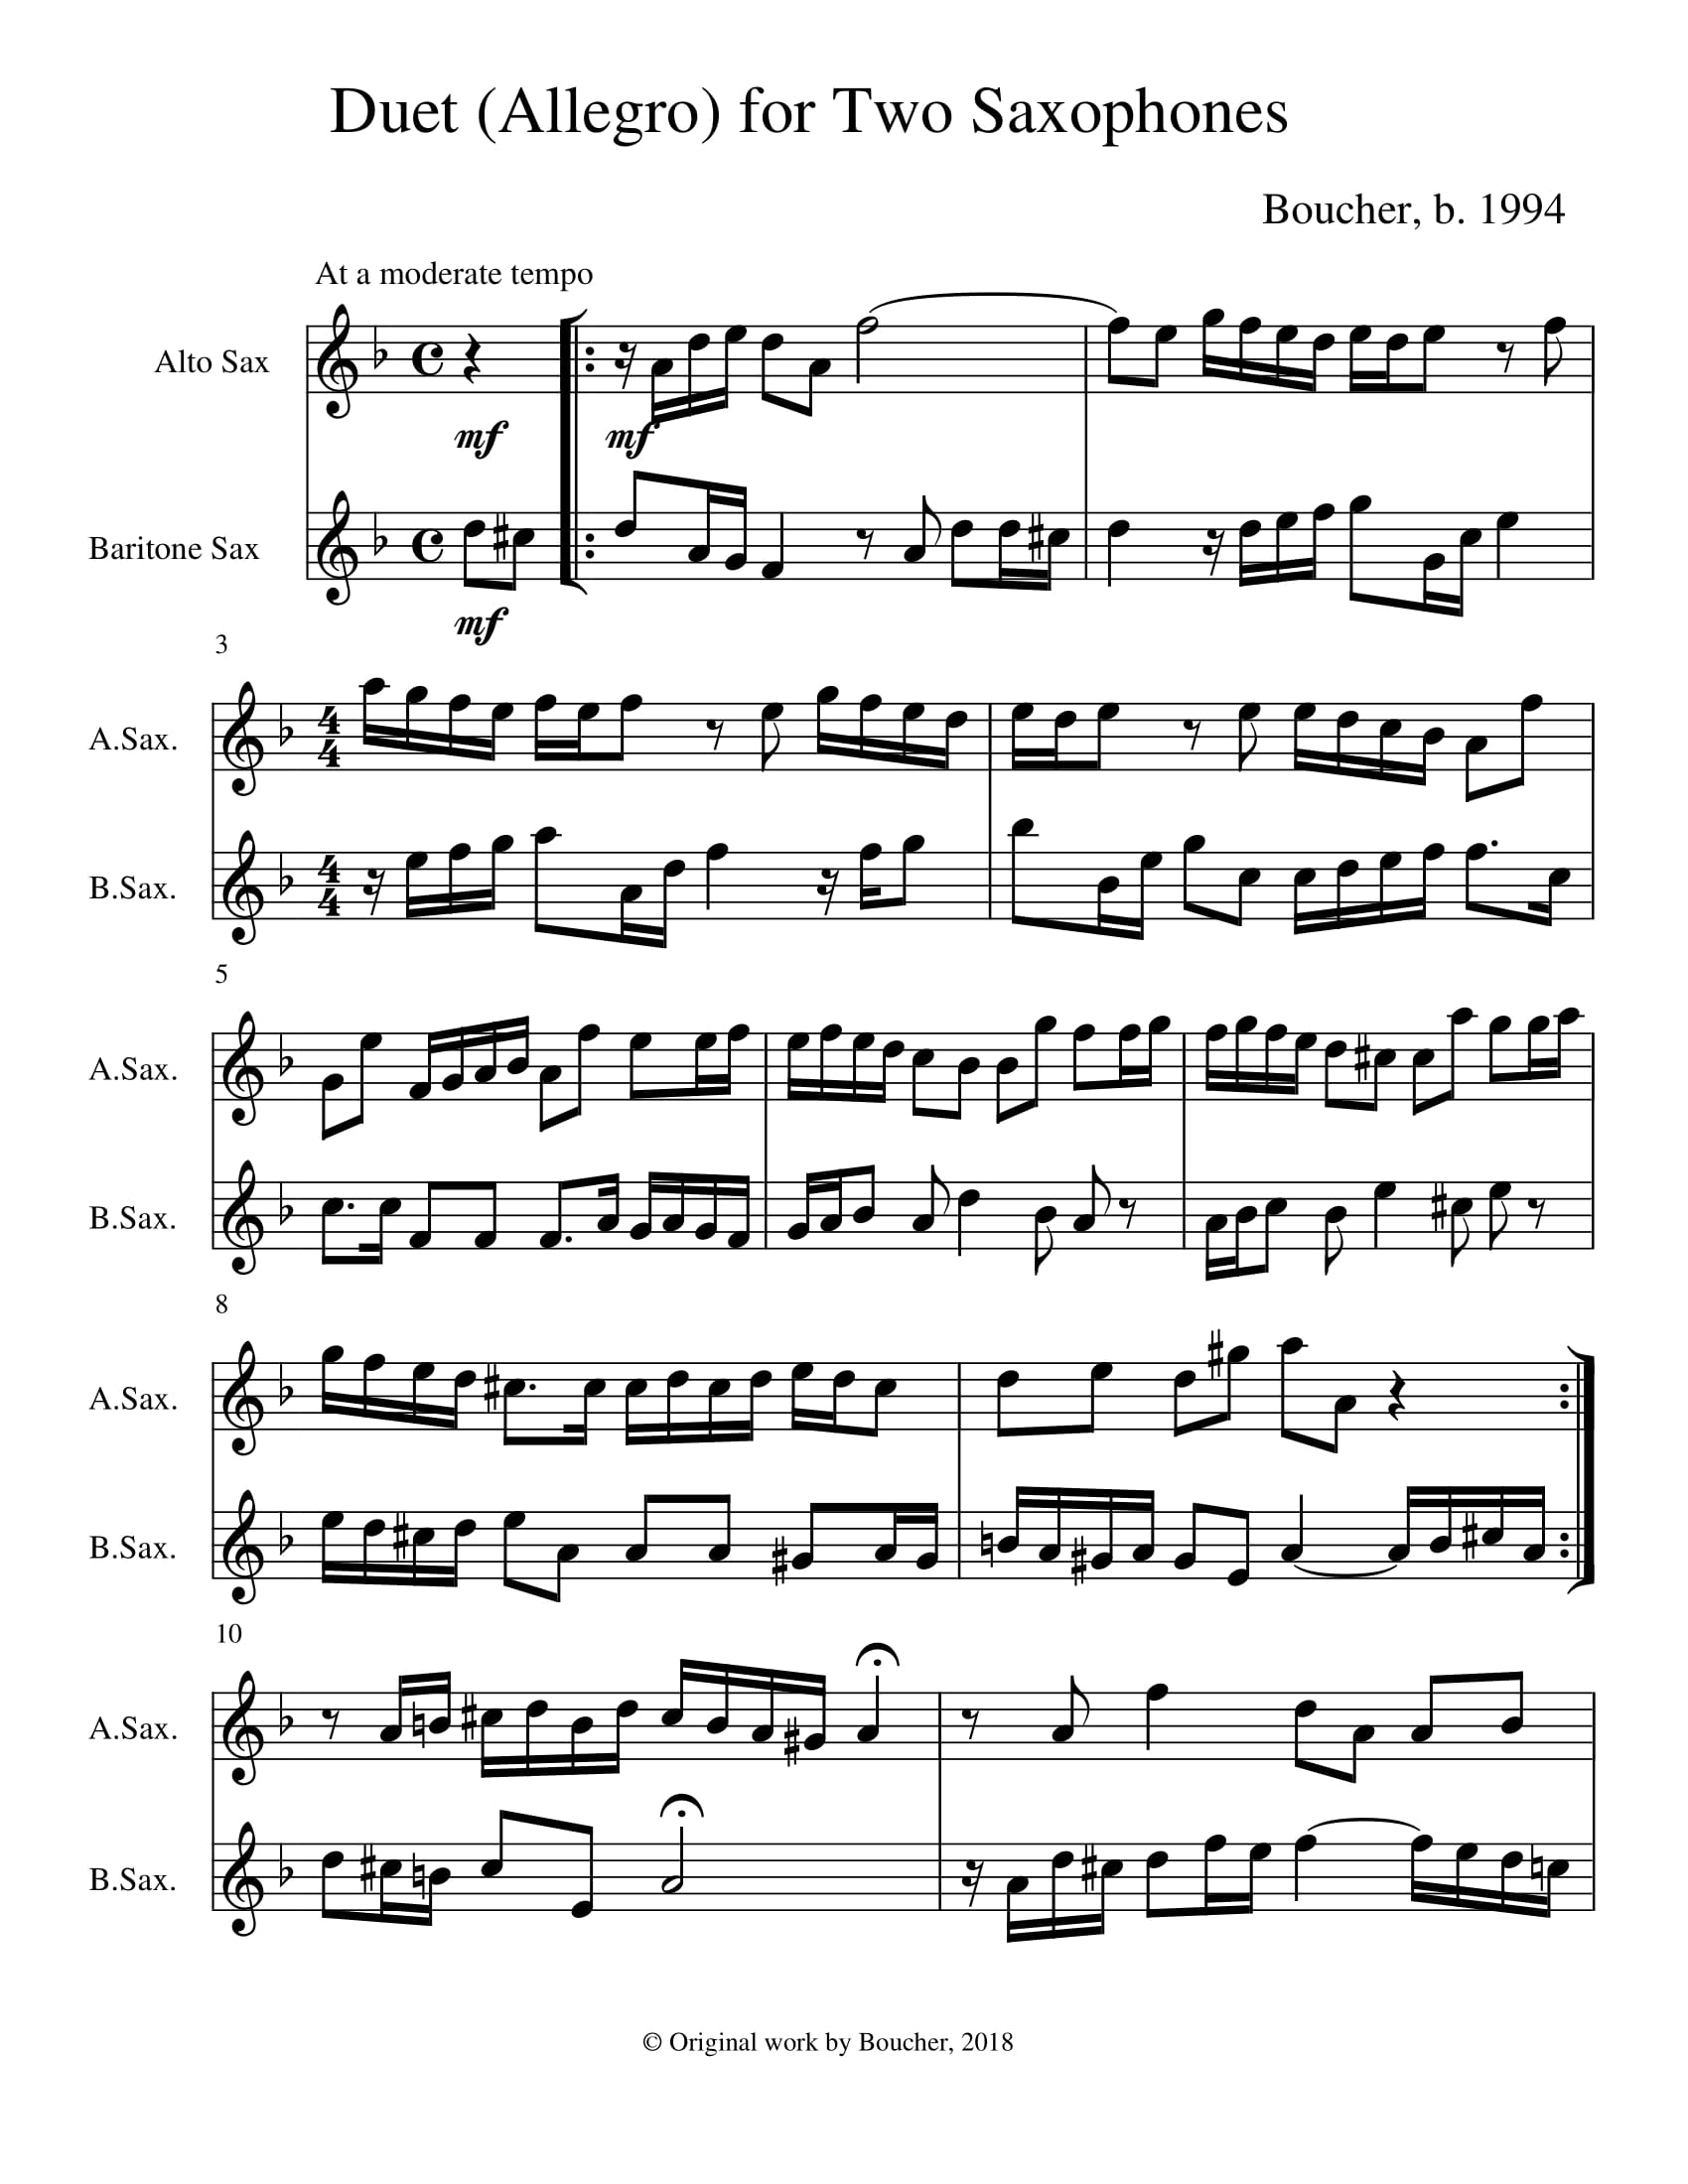 Duet for Two Saxophones